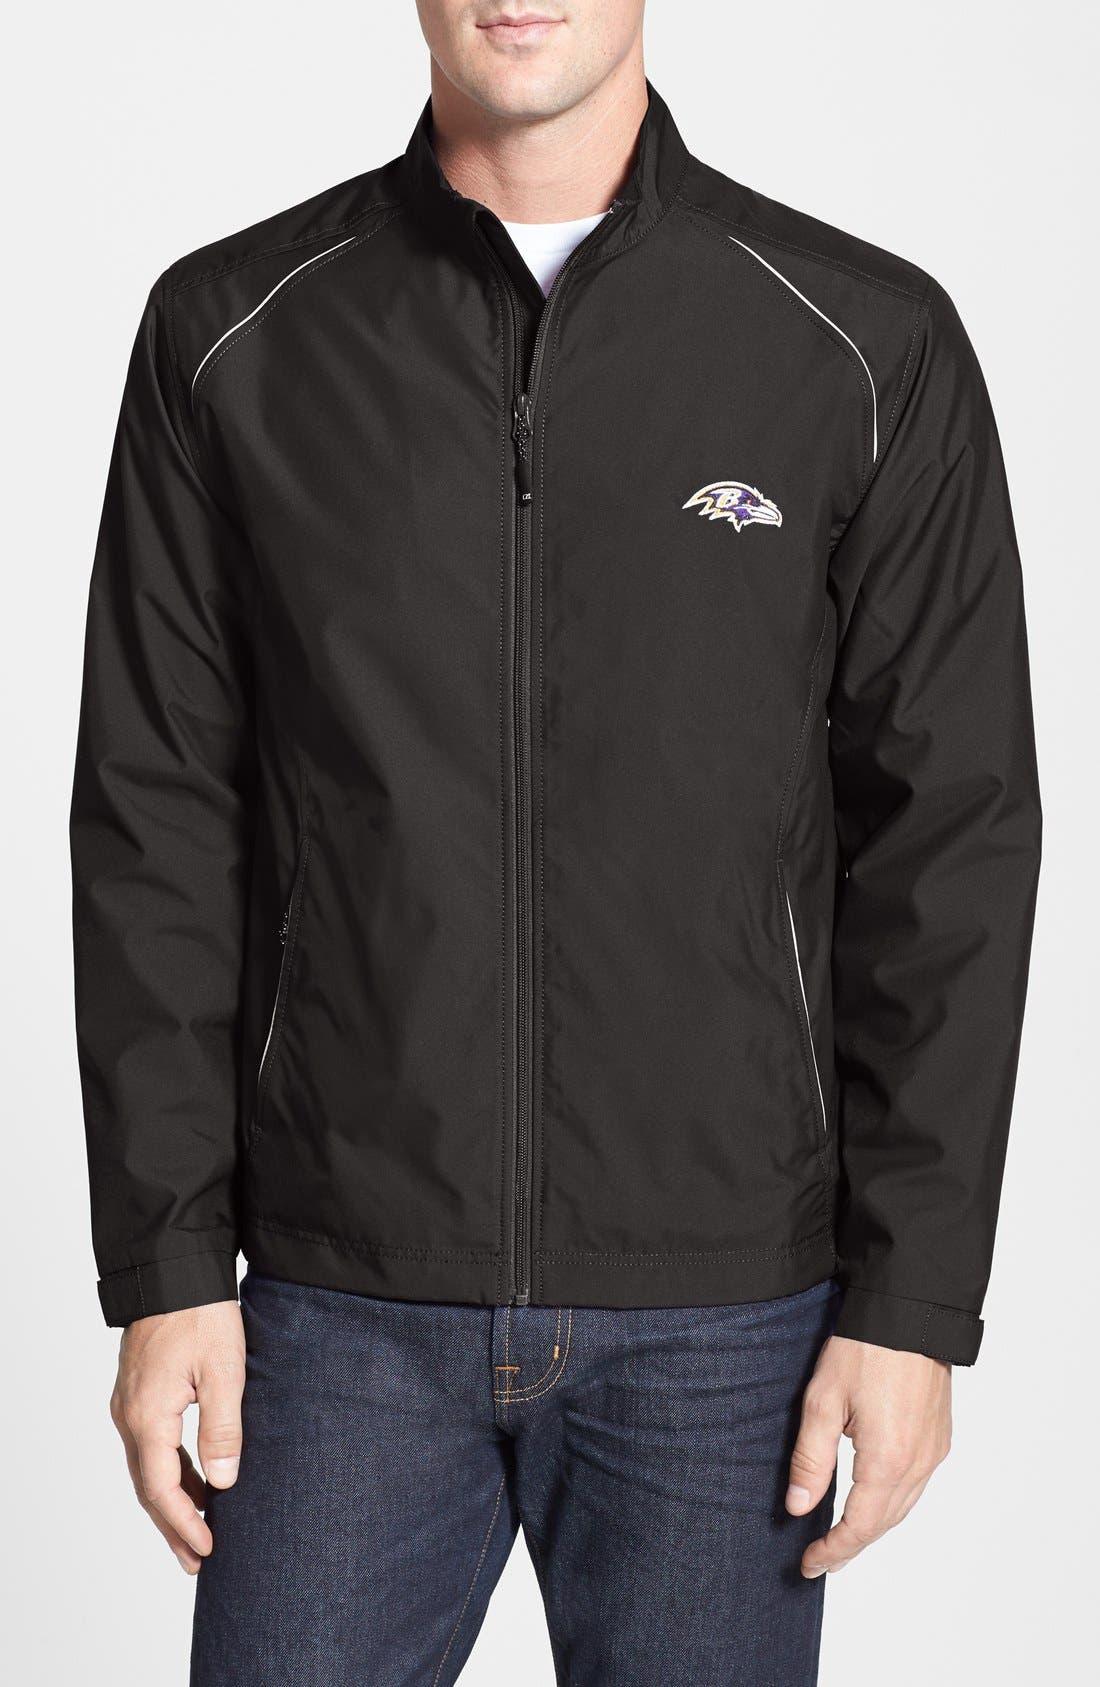 Baltimore Ravens - Beacon WeatherTec Wind & Water Resistant Jacket,                             Main thumbnail 1, color,                             001